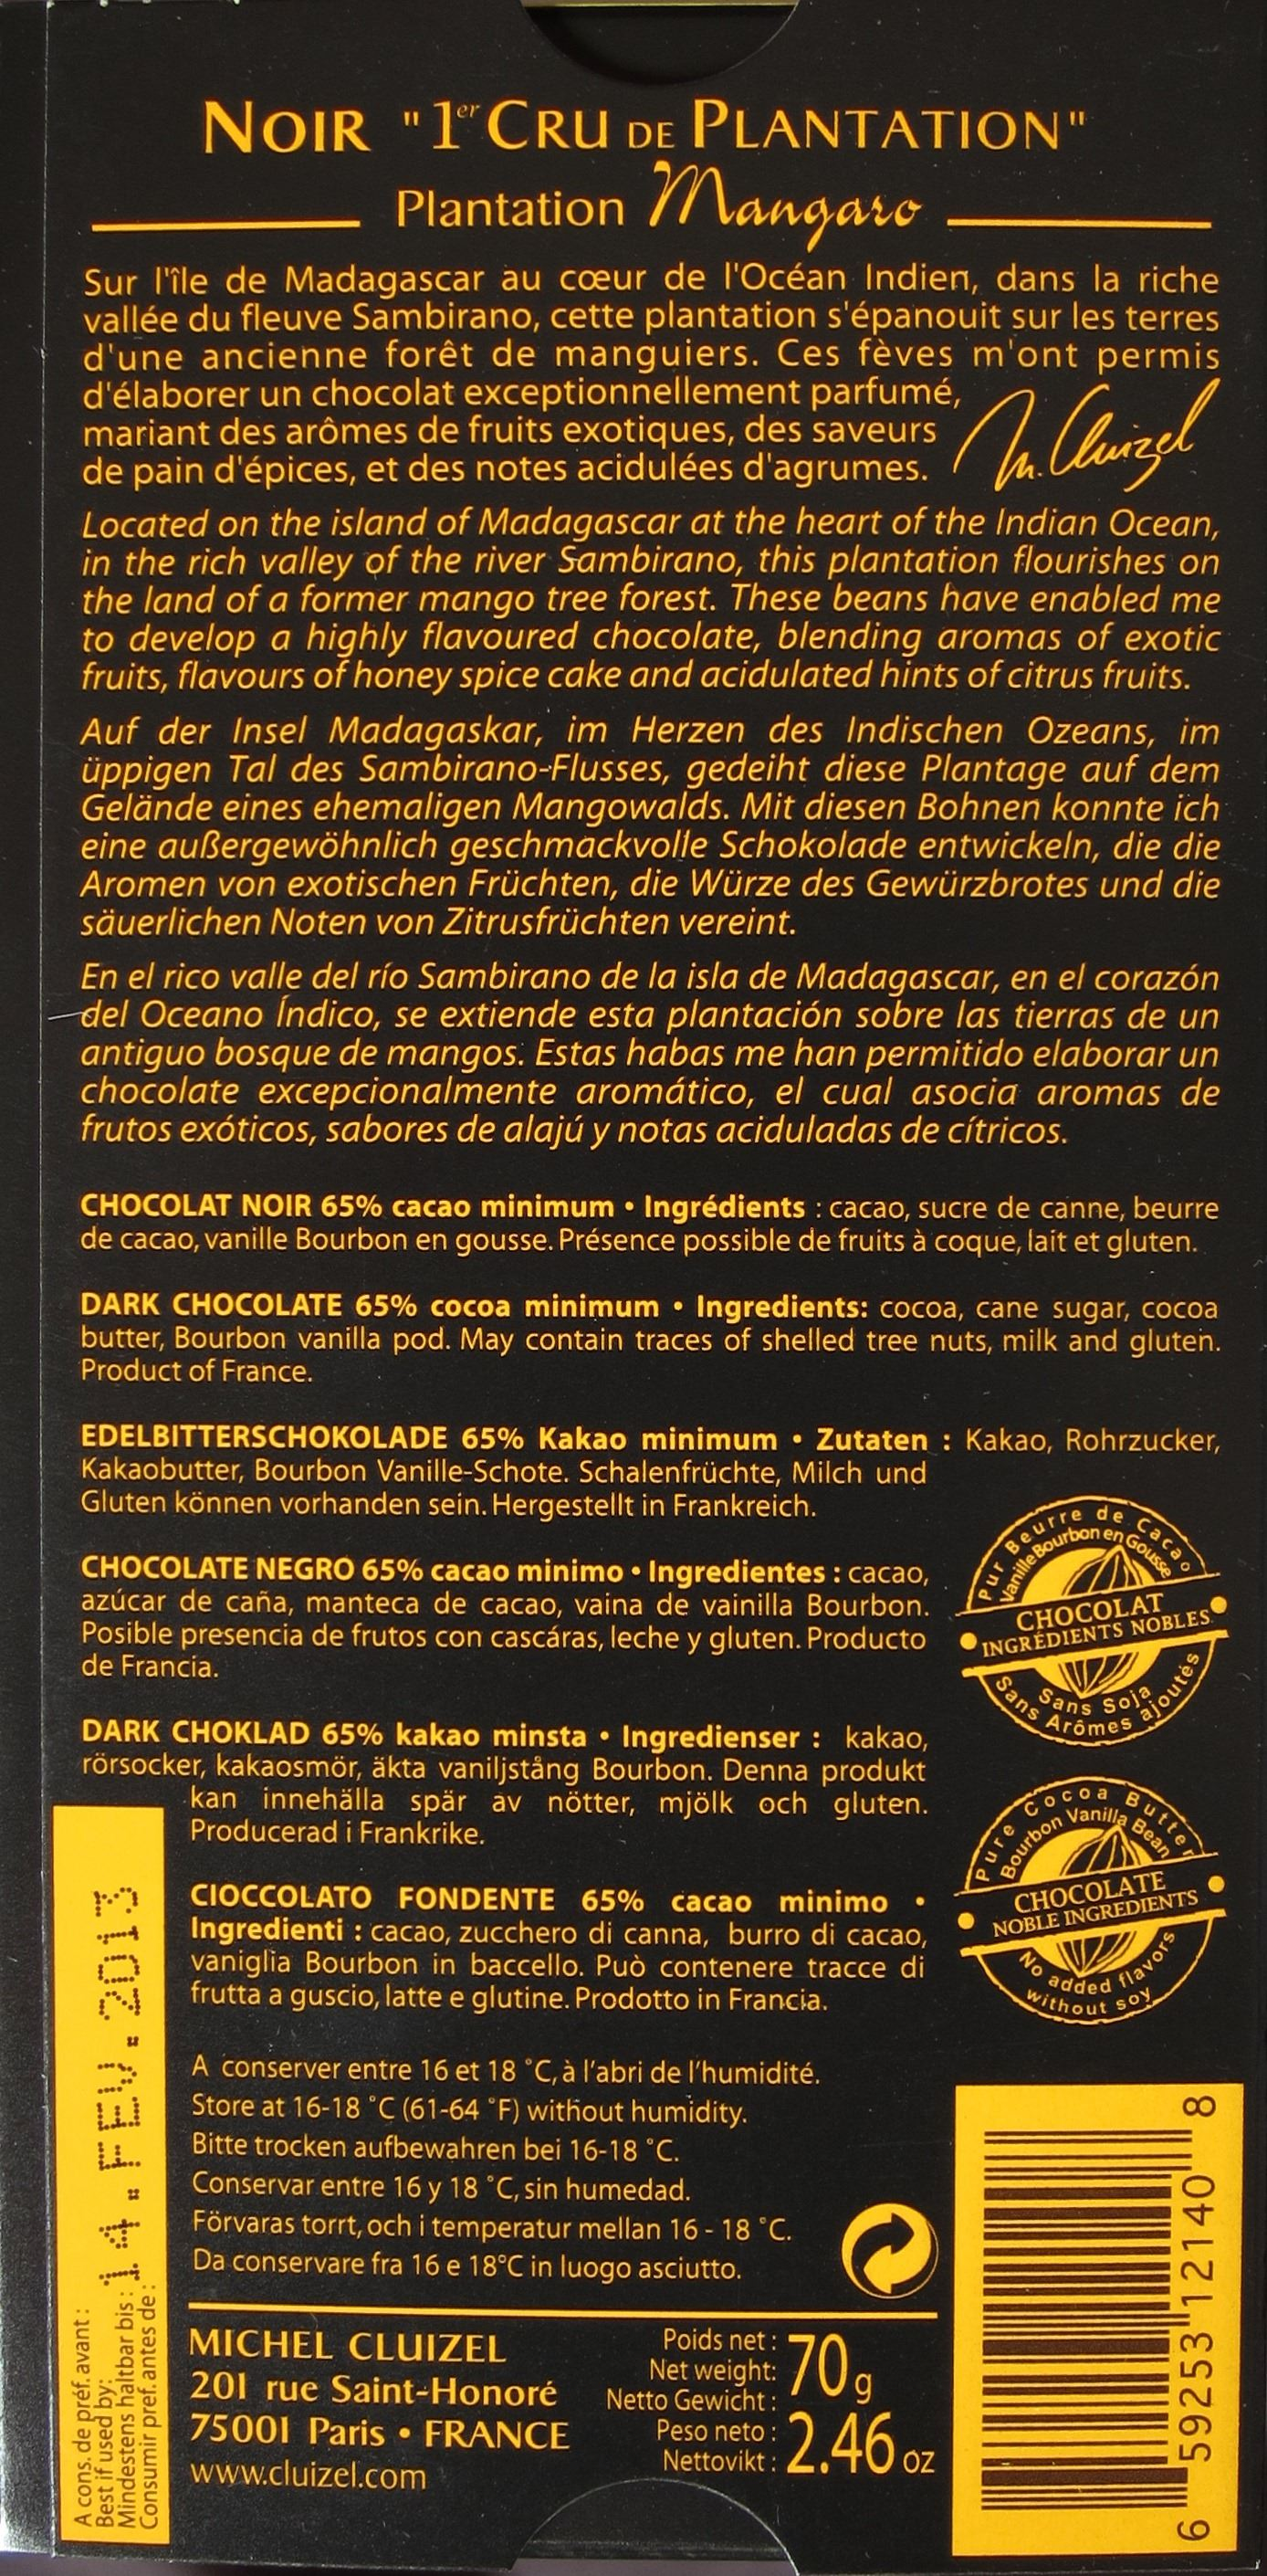 "Michel Cluizel ""Mangaro"" Edelbitterschokolade, 65% - Inhaltsangaben"